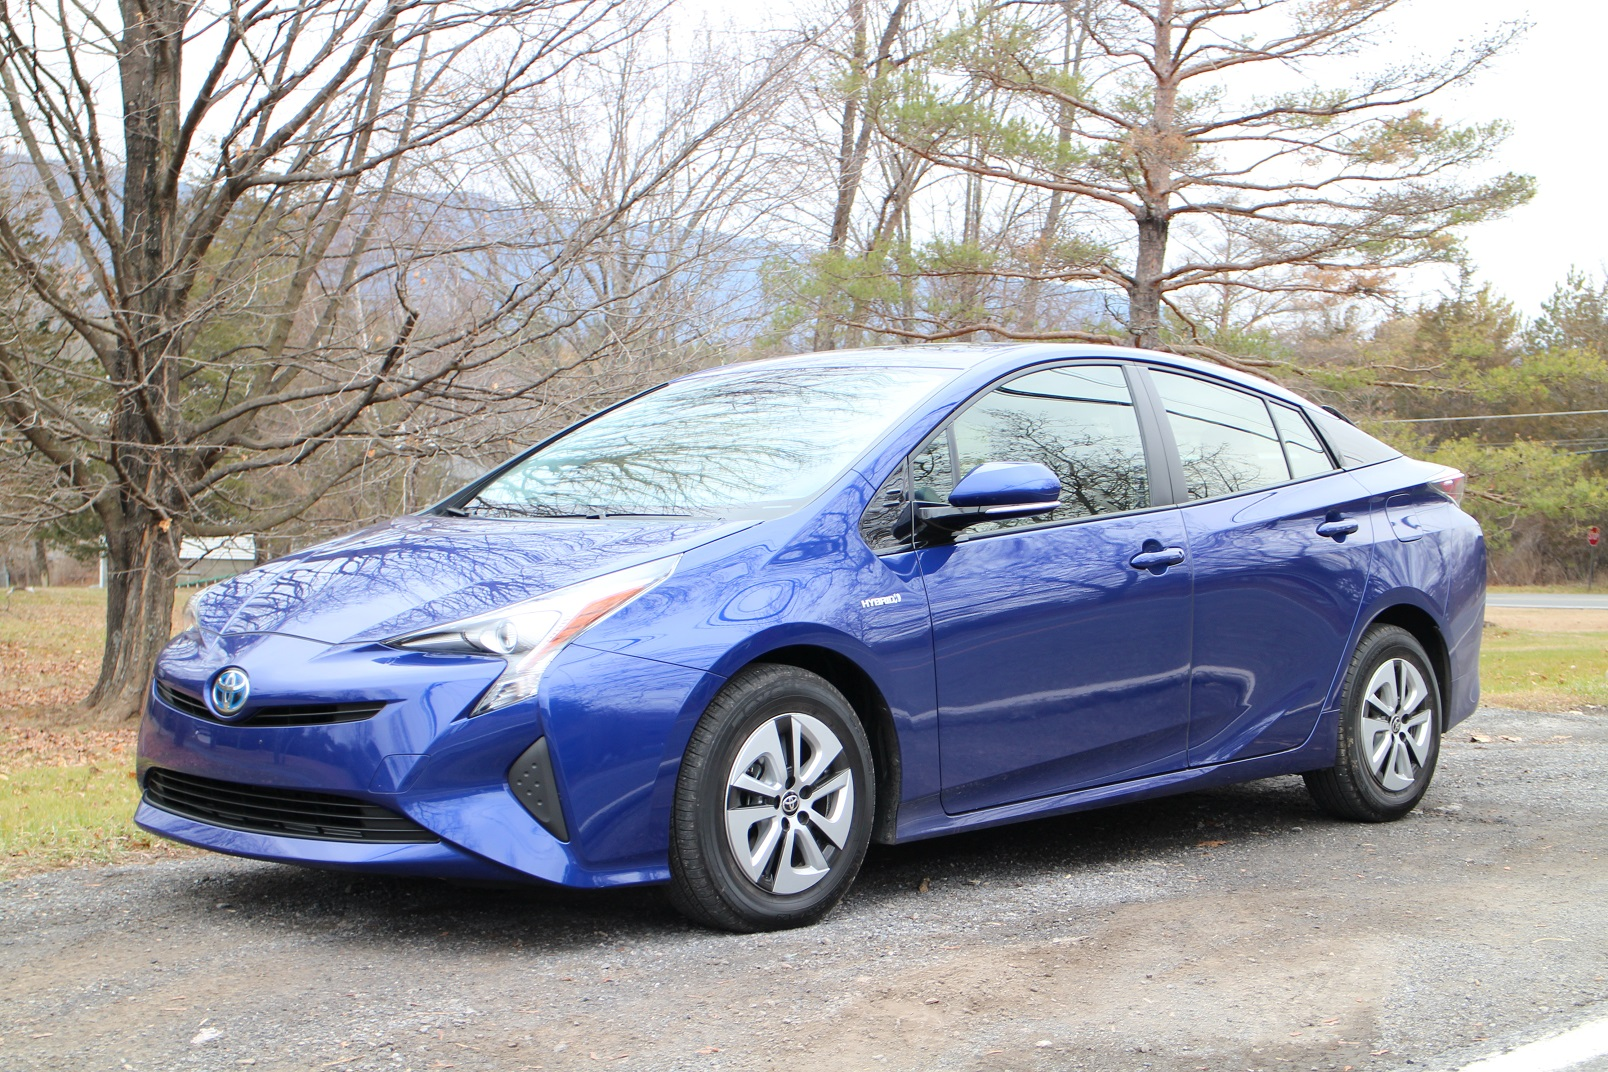 Electric-Car Trends, Tesla Model 3, GM Vs LG, VW Diesels ...